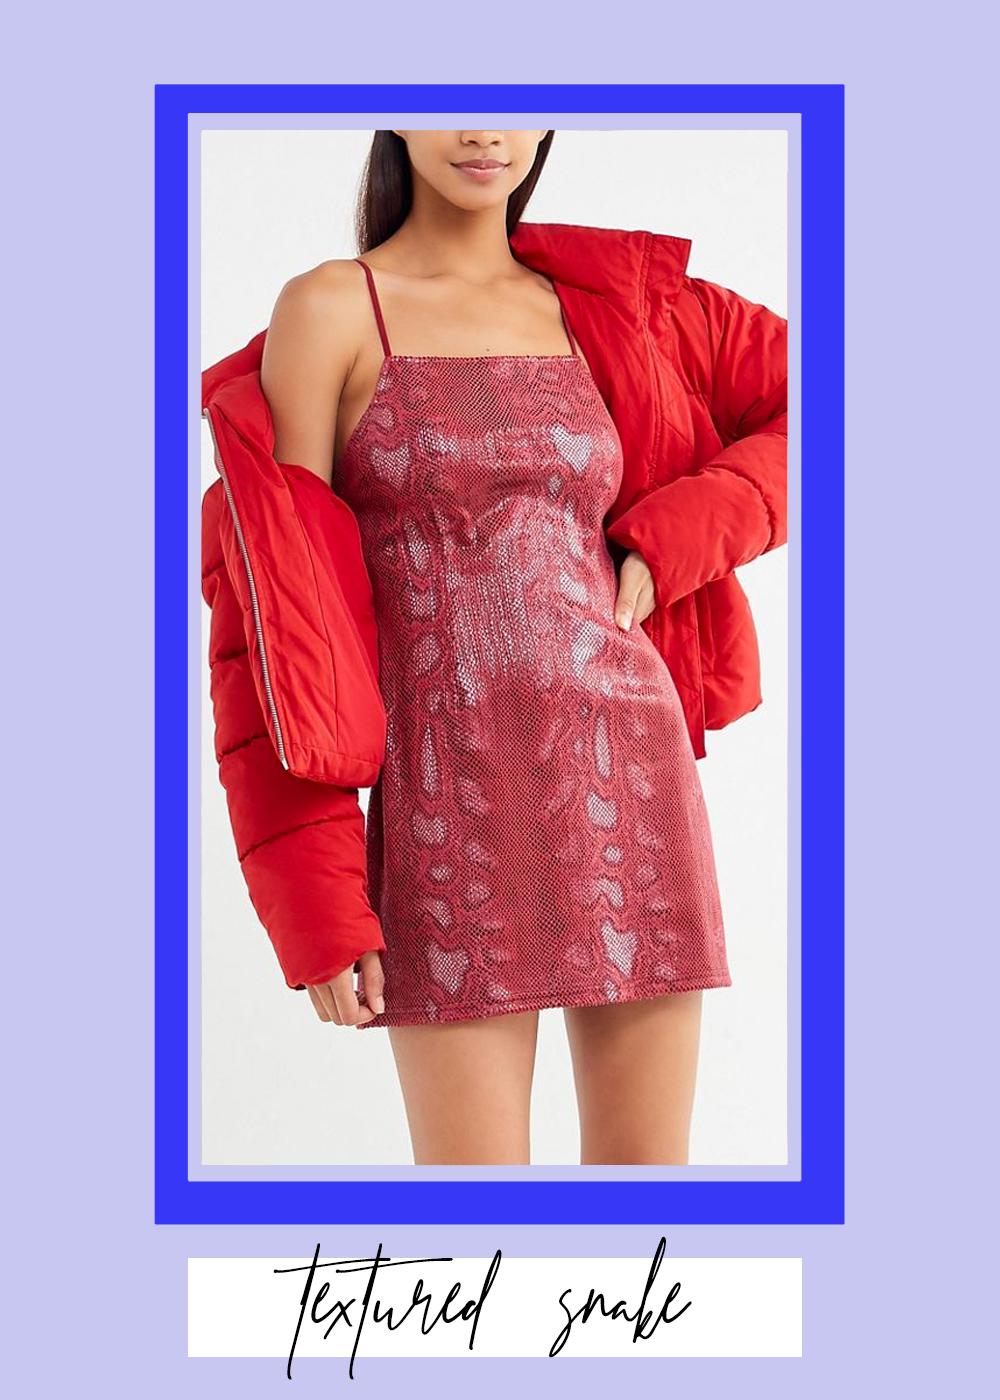 002. - Textured Snake Mini Dress // $59